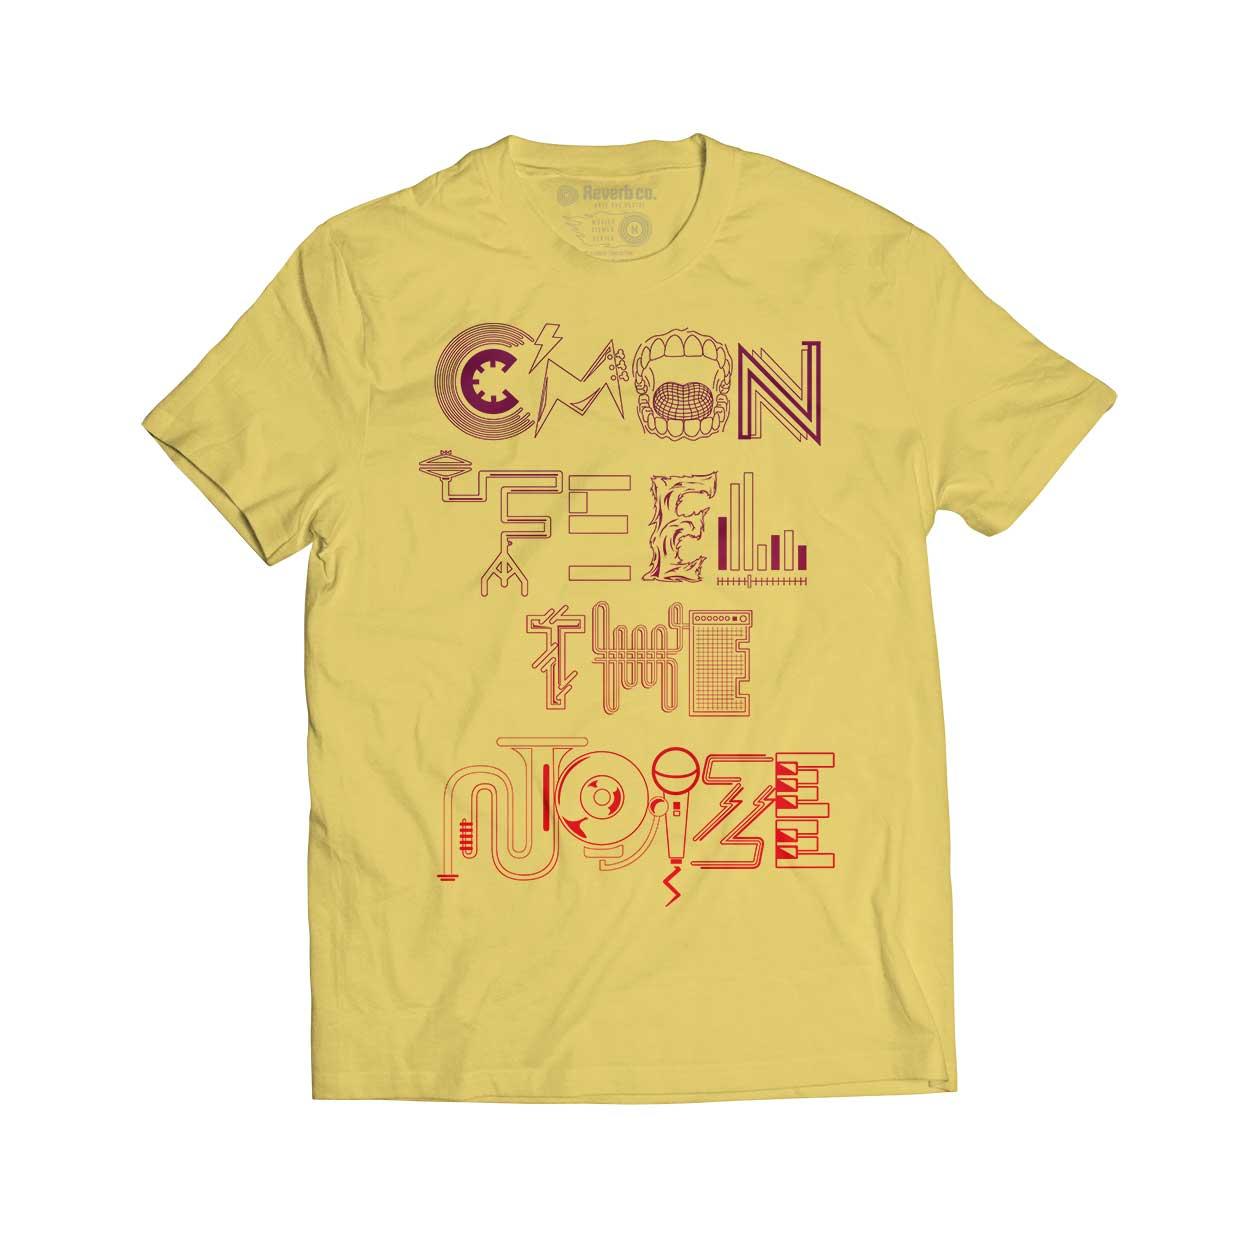 Camiseta Cmon Feel the Noize - Masculino